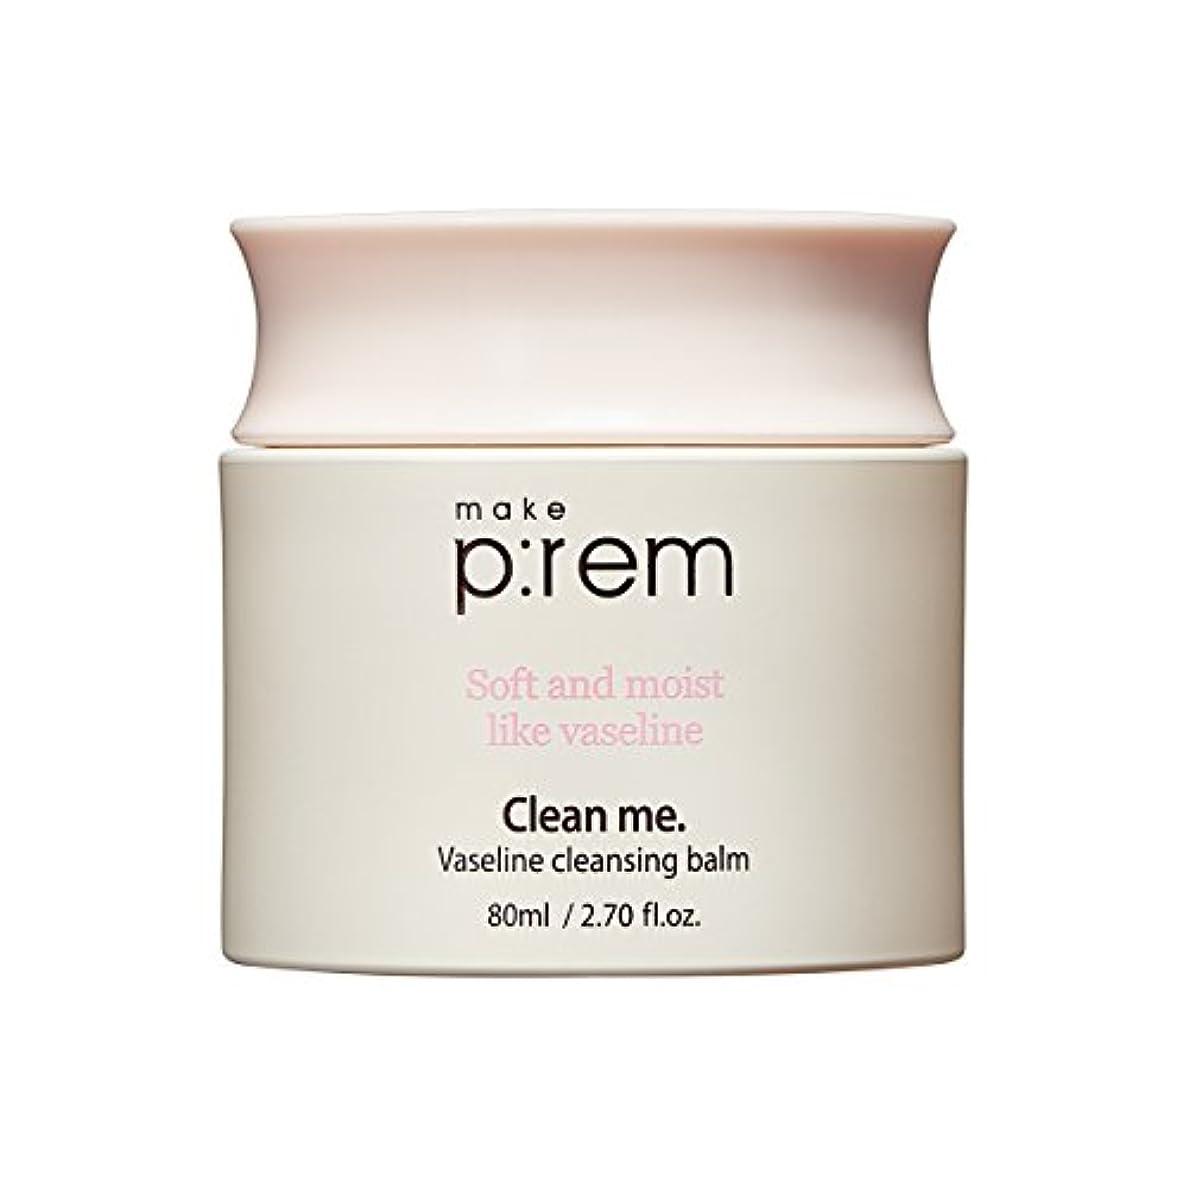 [MAKE P:REM] clean me ワセリン クレンジング バーム Vaseline cleansing balm 80ml / 韓国コスメ, 韓国直送品